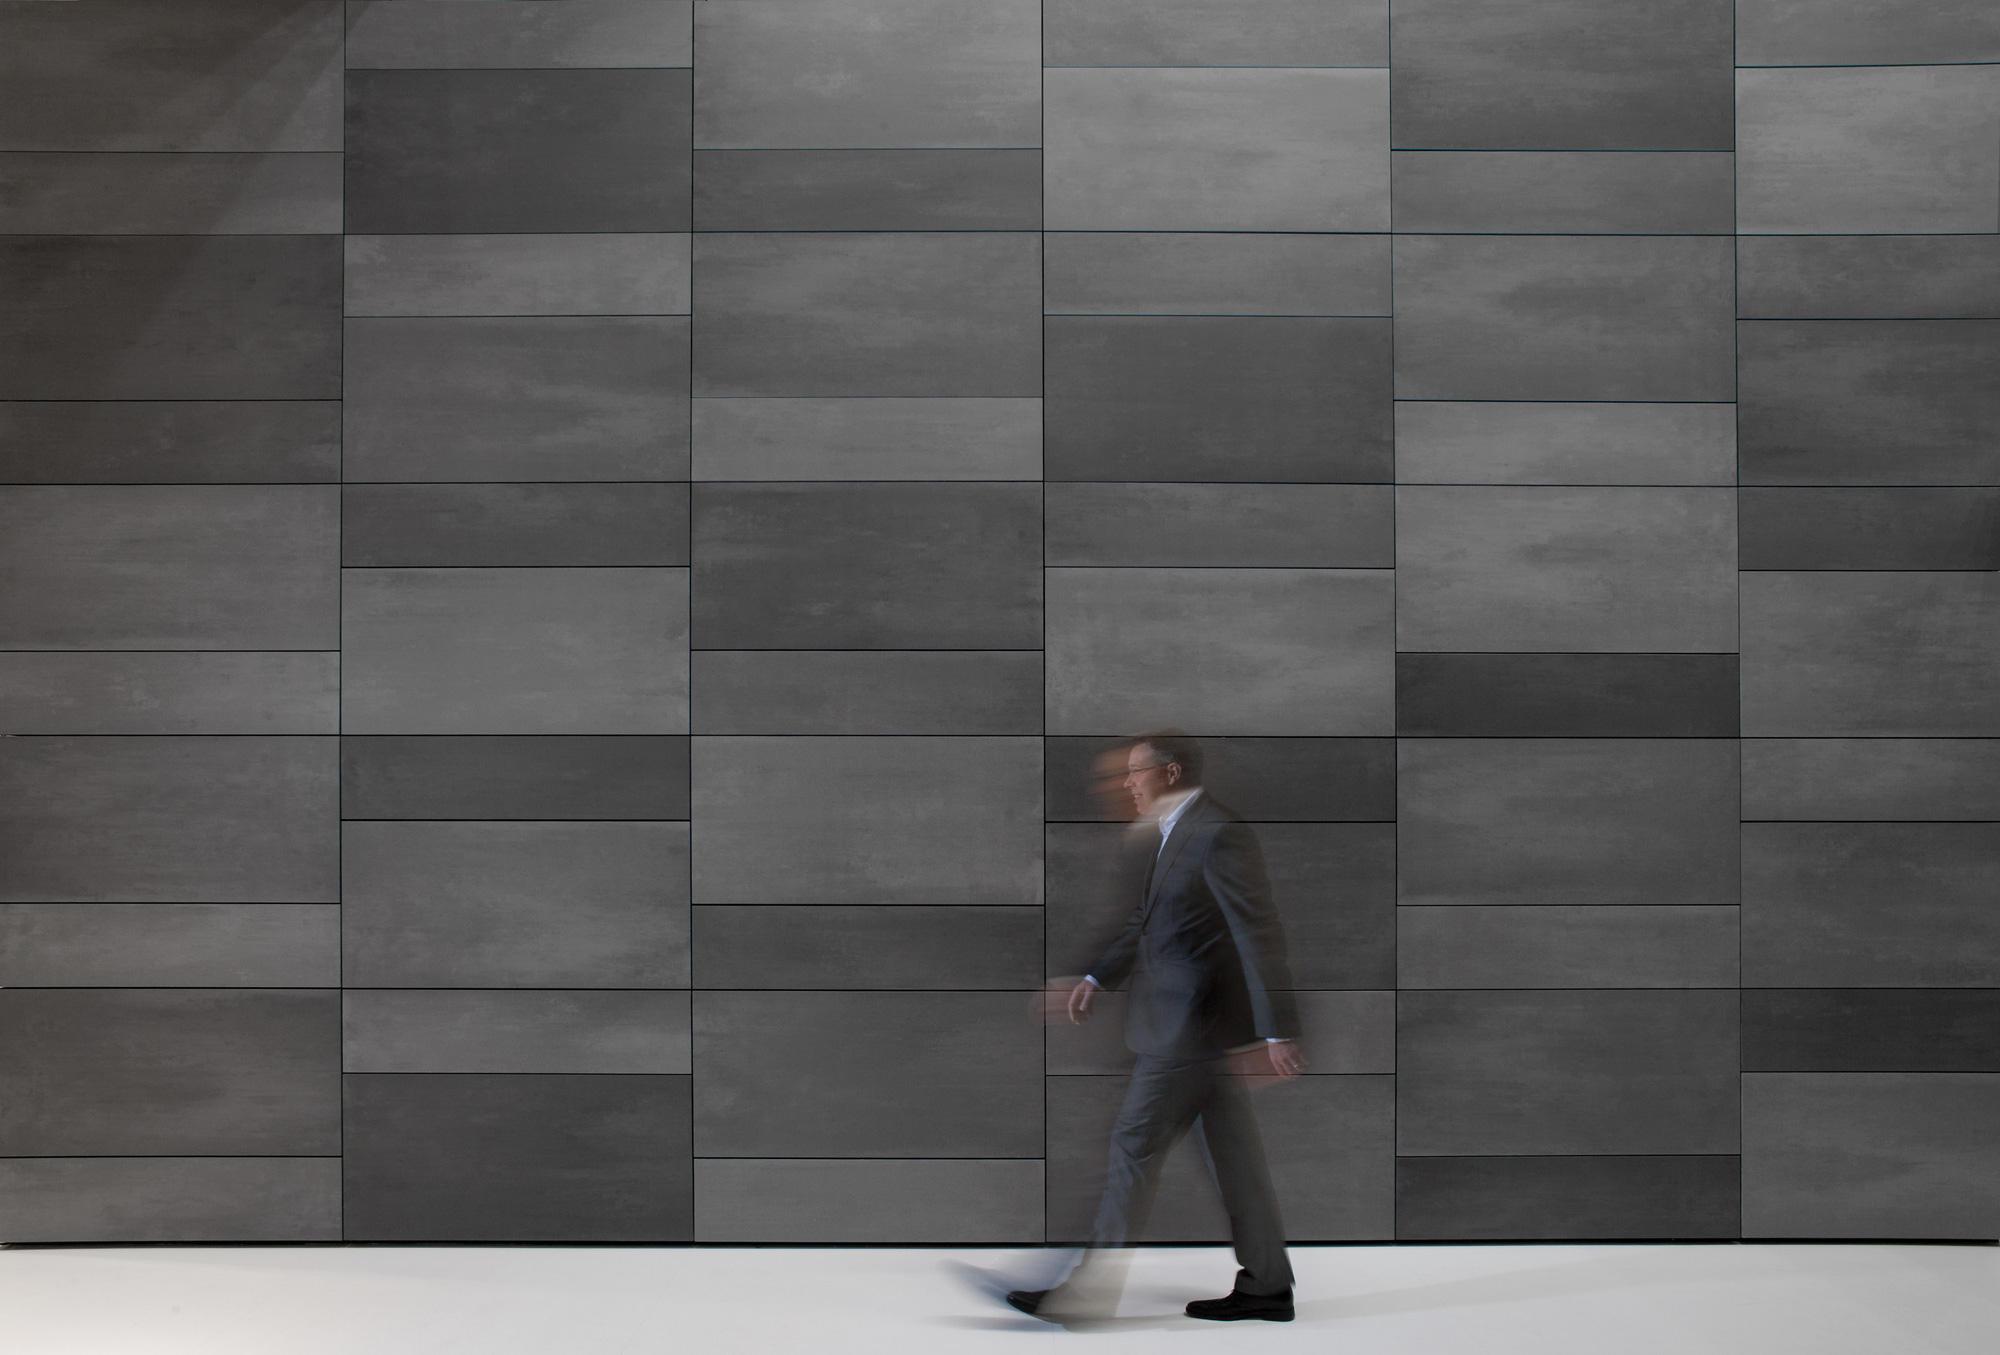 Terra Tones Ceramic Tiles From Mosa Architonic